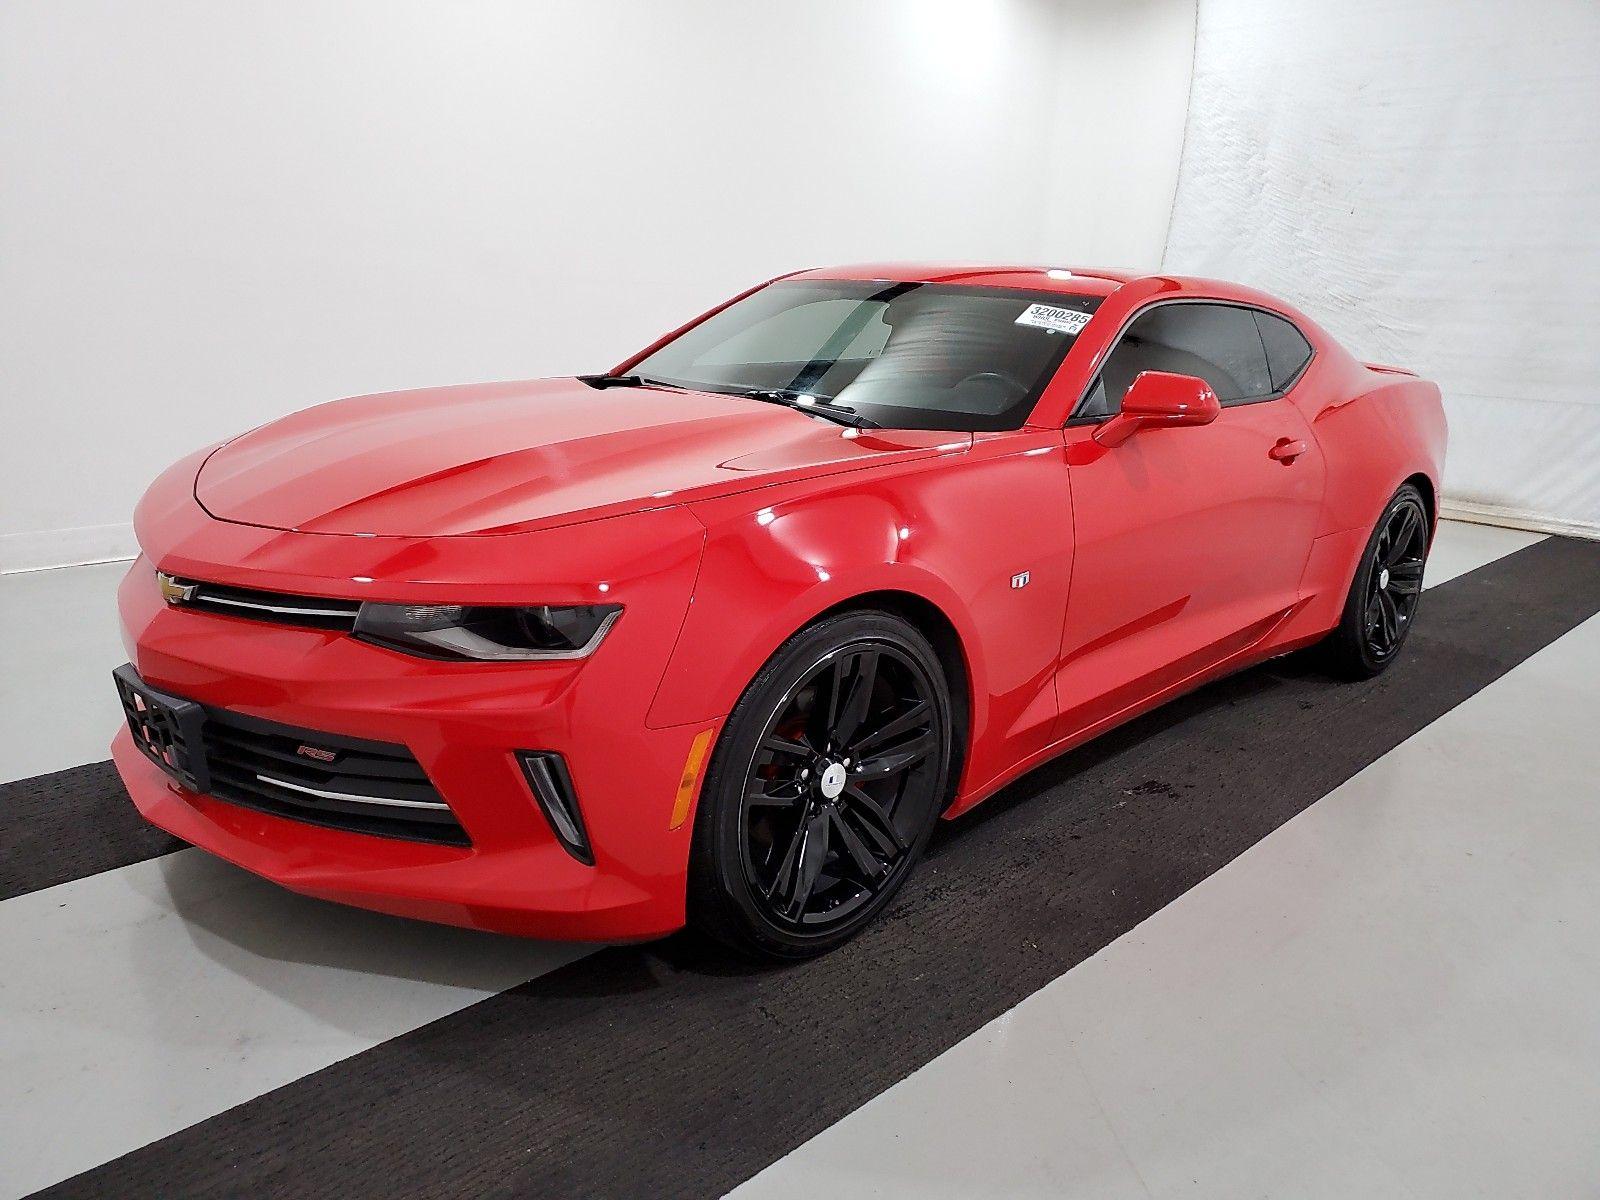 2018 Chevrolet Camaro 3.6. Lot 99913819194 Vin 1G1FB1RS7J0132682